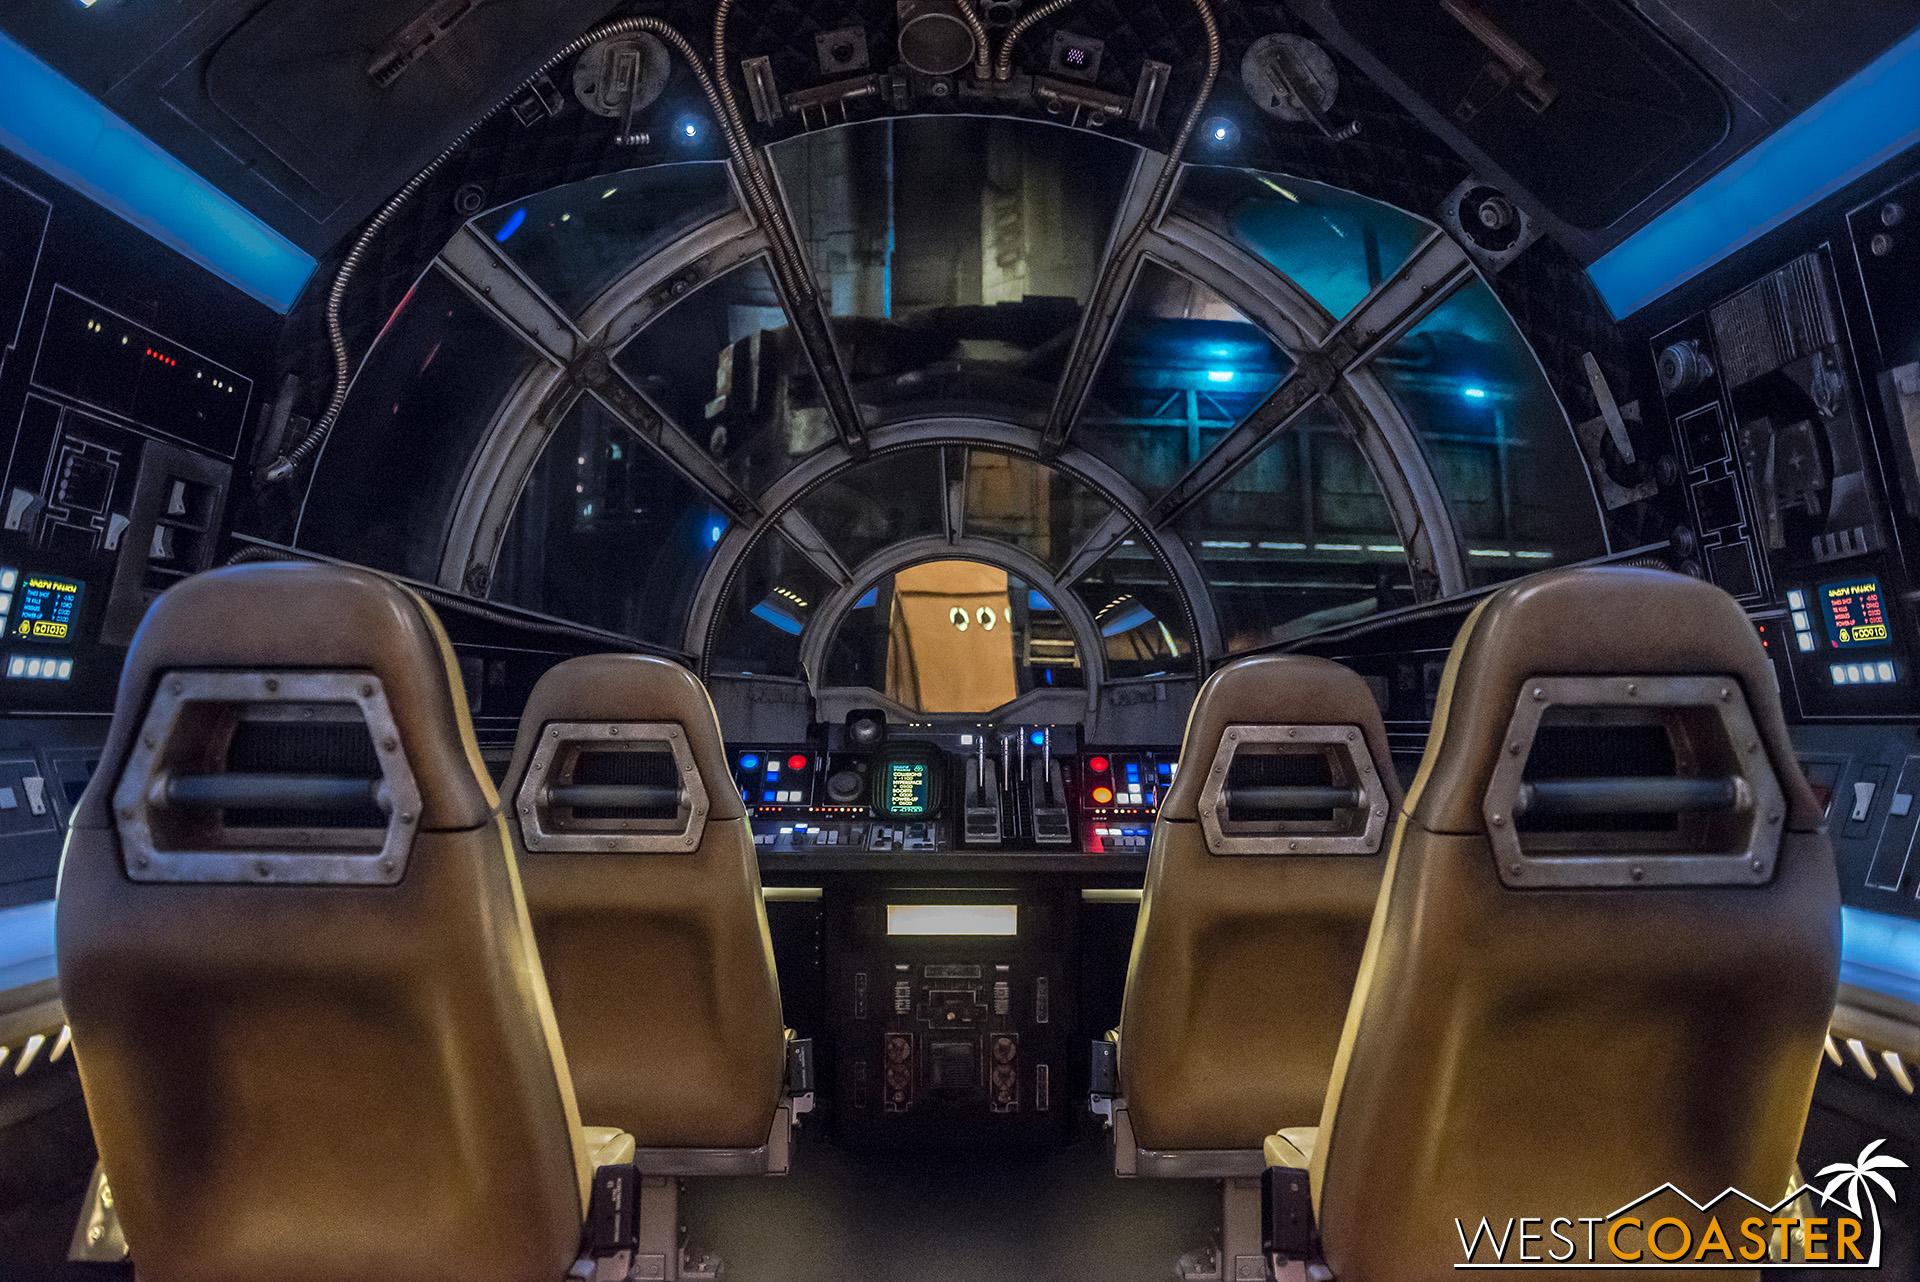 DLR-19_0606-D-Cockpit-0002.jpg